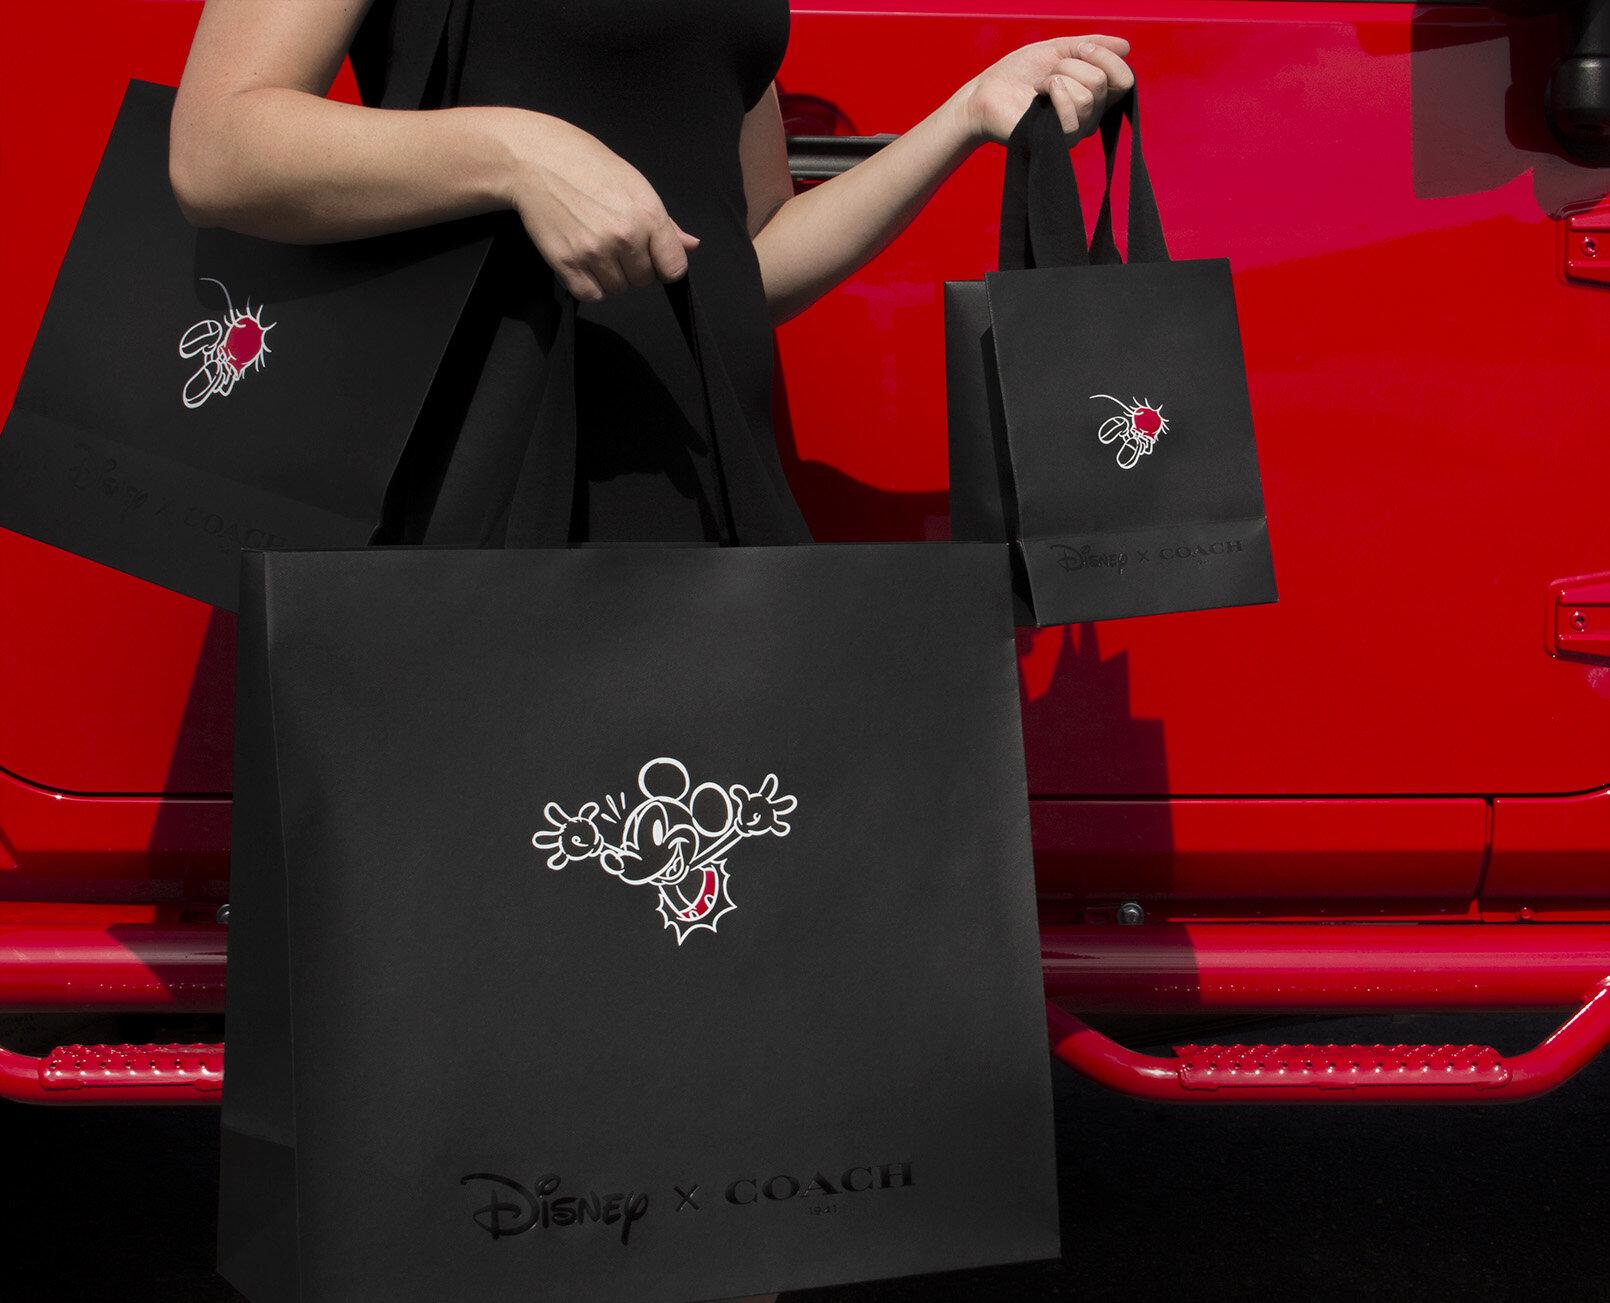 迪士尼X-Coach-retail-Packaging-Program-Design Packaging.jpg